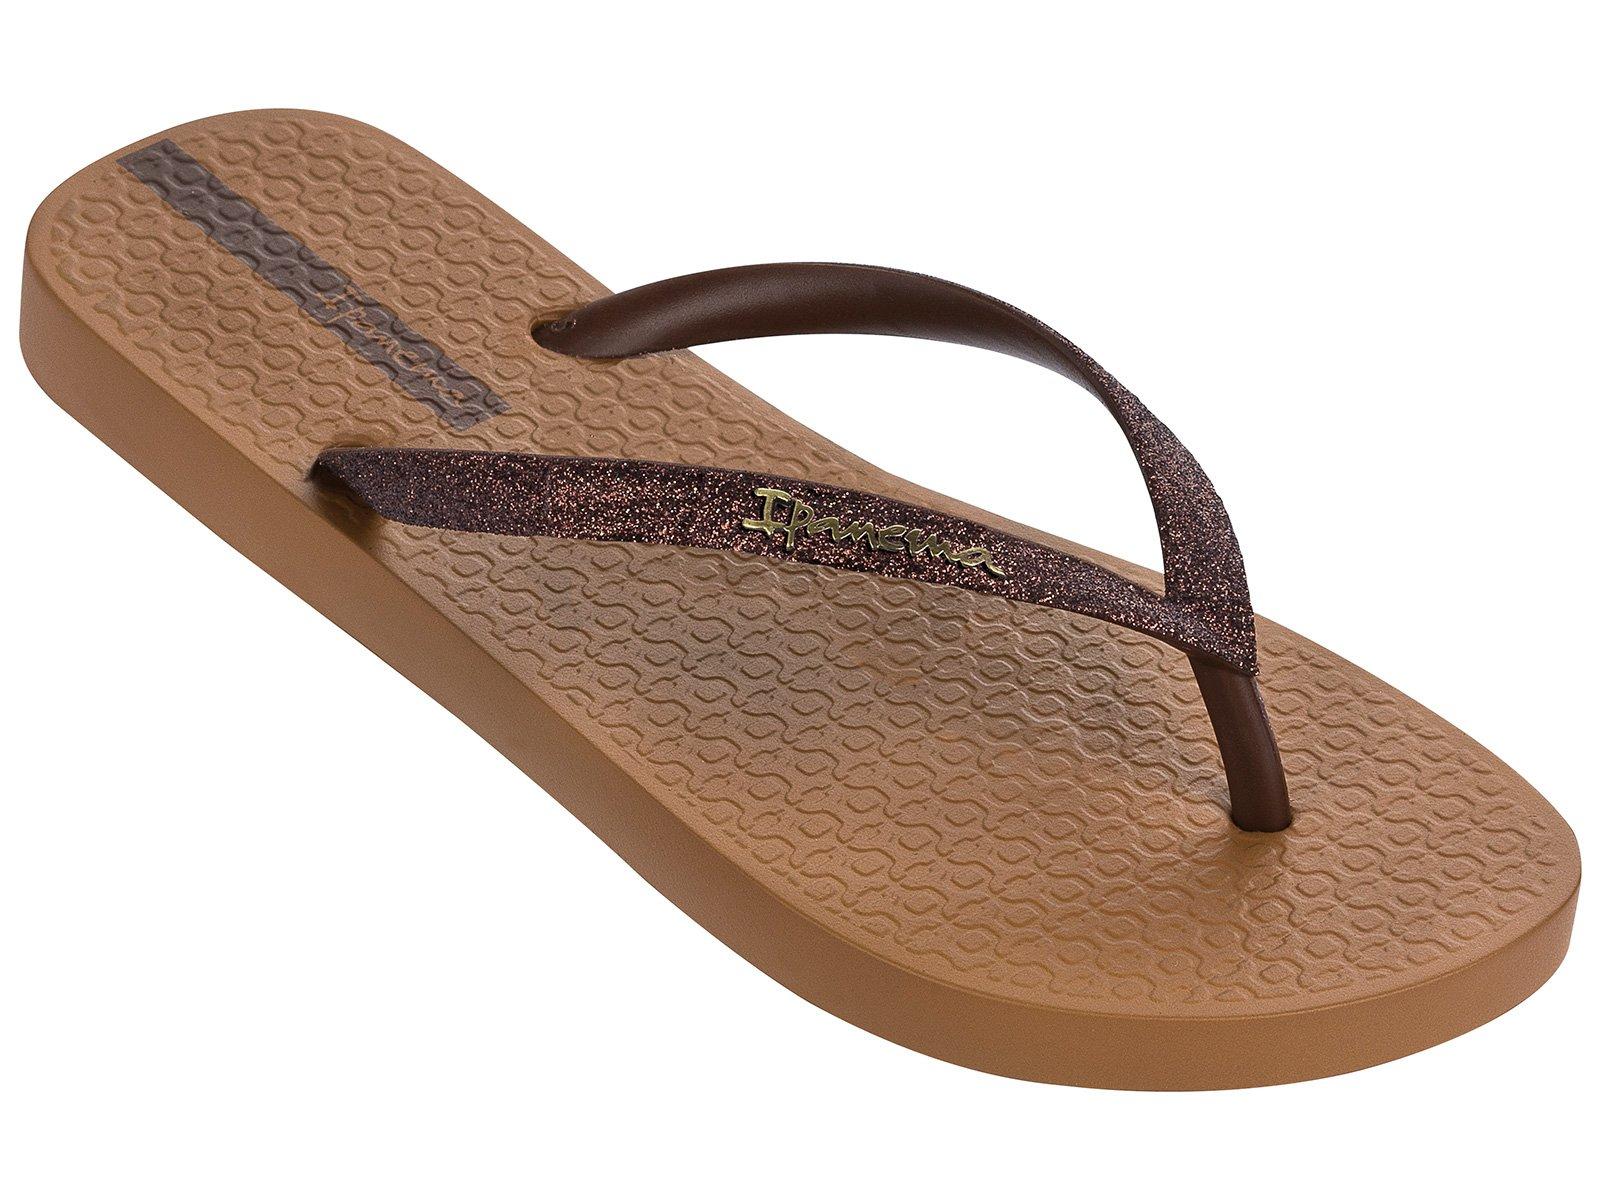 adc0e6e8d Flip-Flops Flip-flops - Ipanema Lolita Iii Fem Brown/bronze